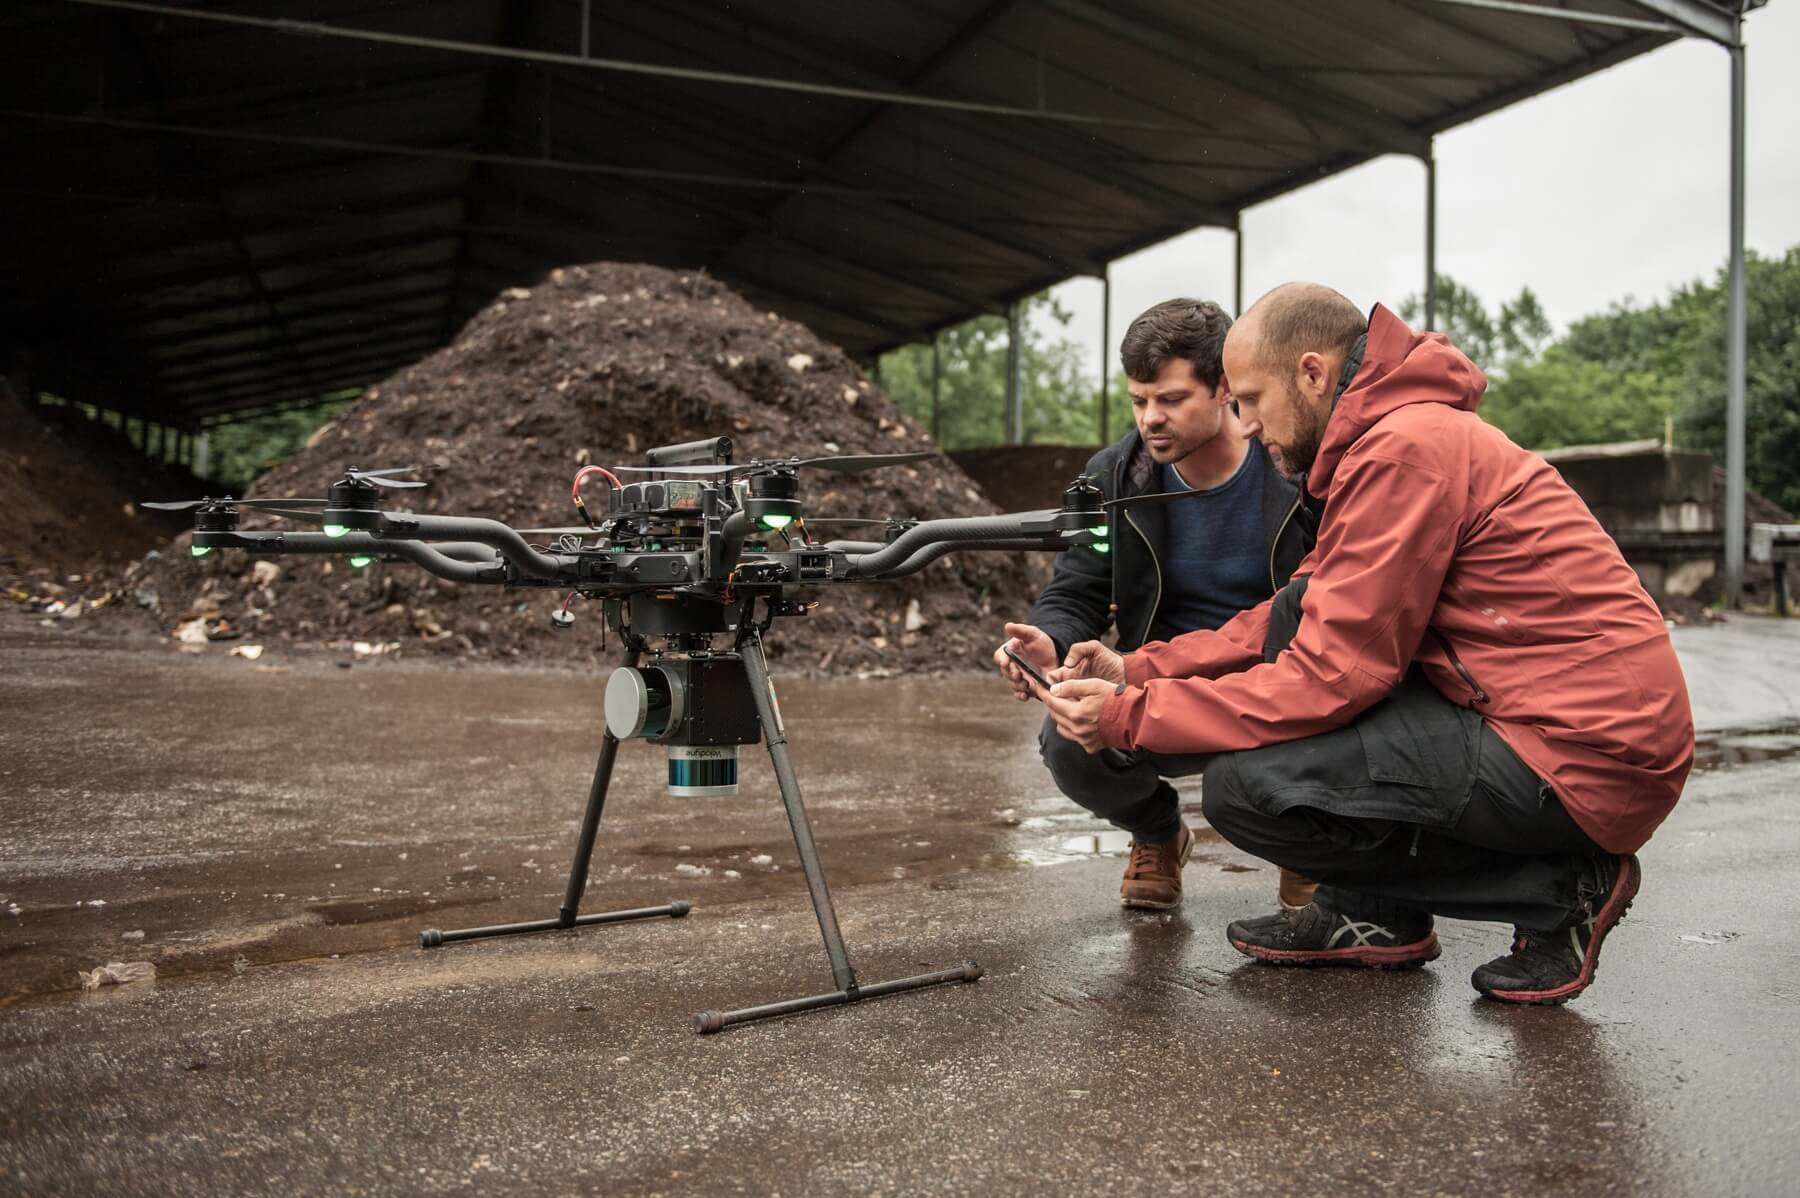 Orthofotos-LiDAR-Drohnen